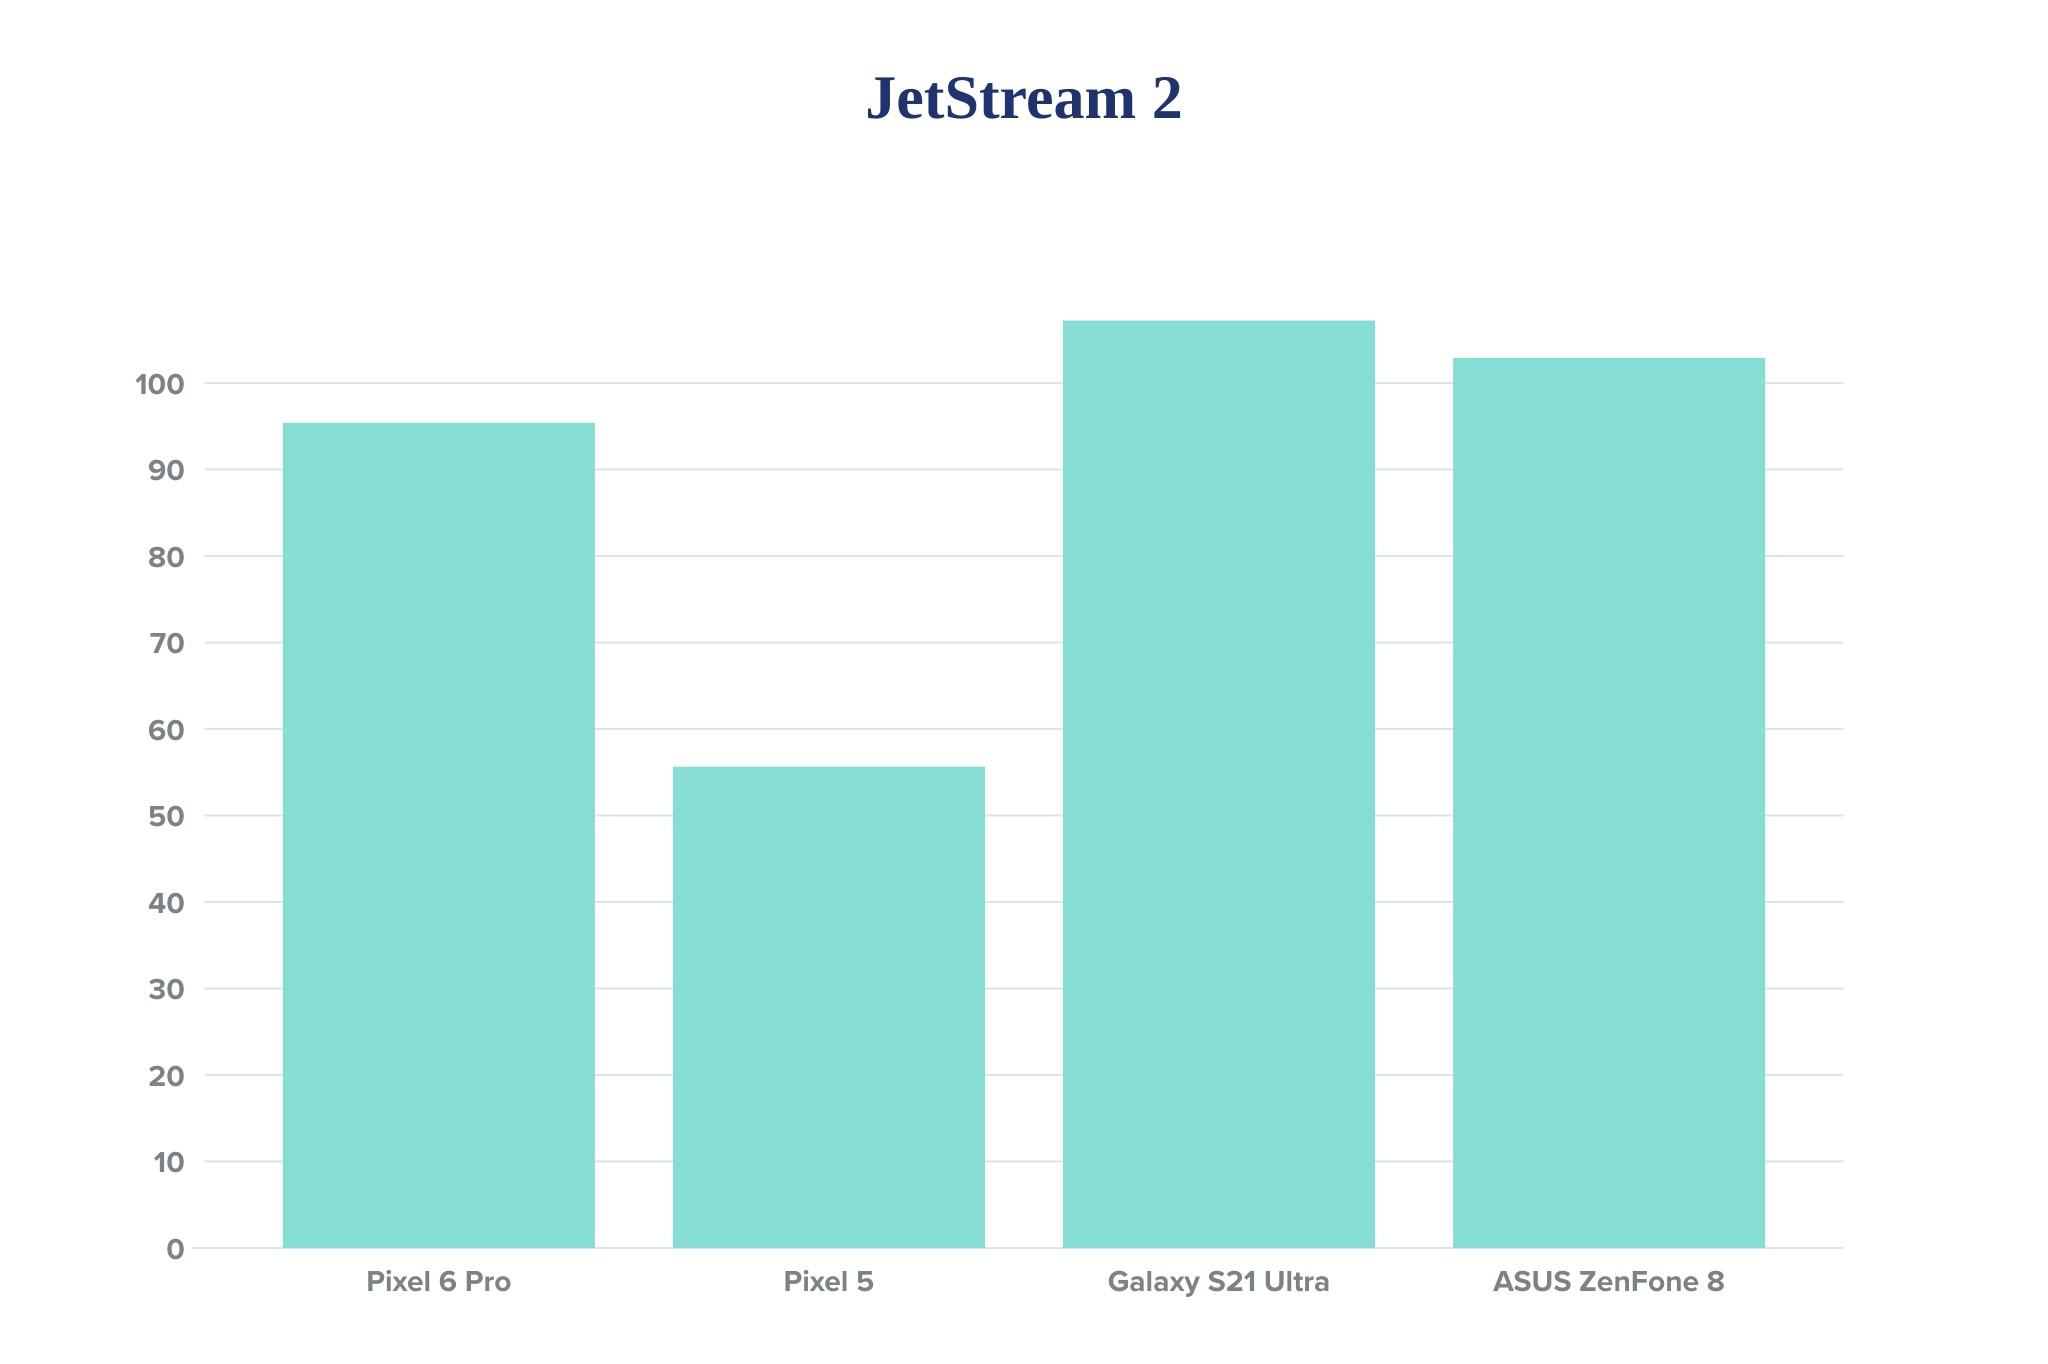 pixel-6-pro-jetstream-benchmark.jpg